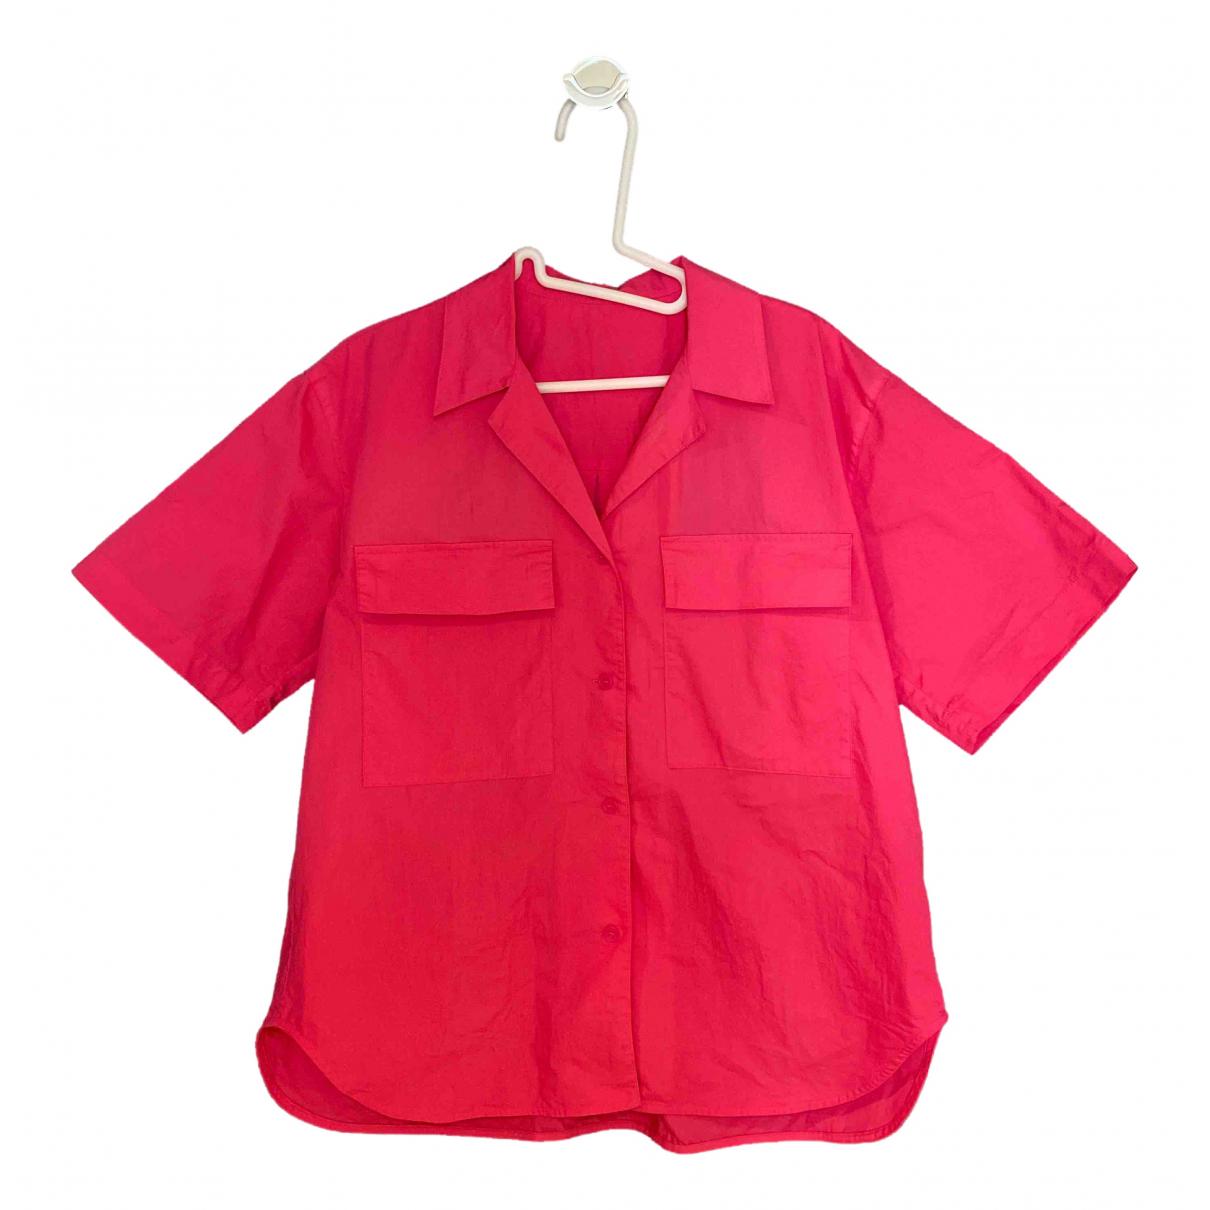 Mo&co - Top   pour femme en coton - rose